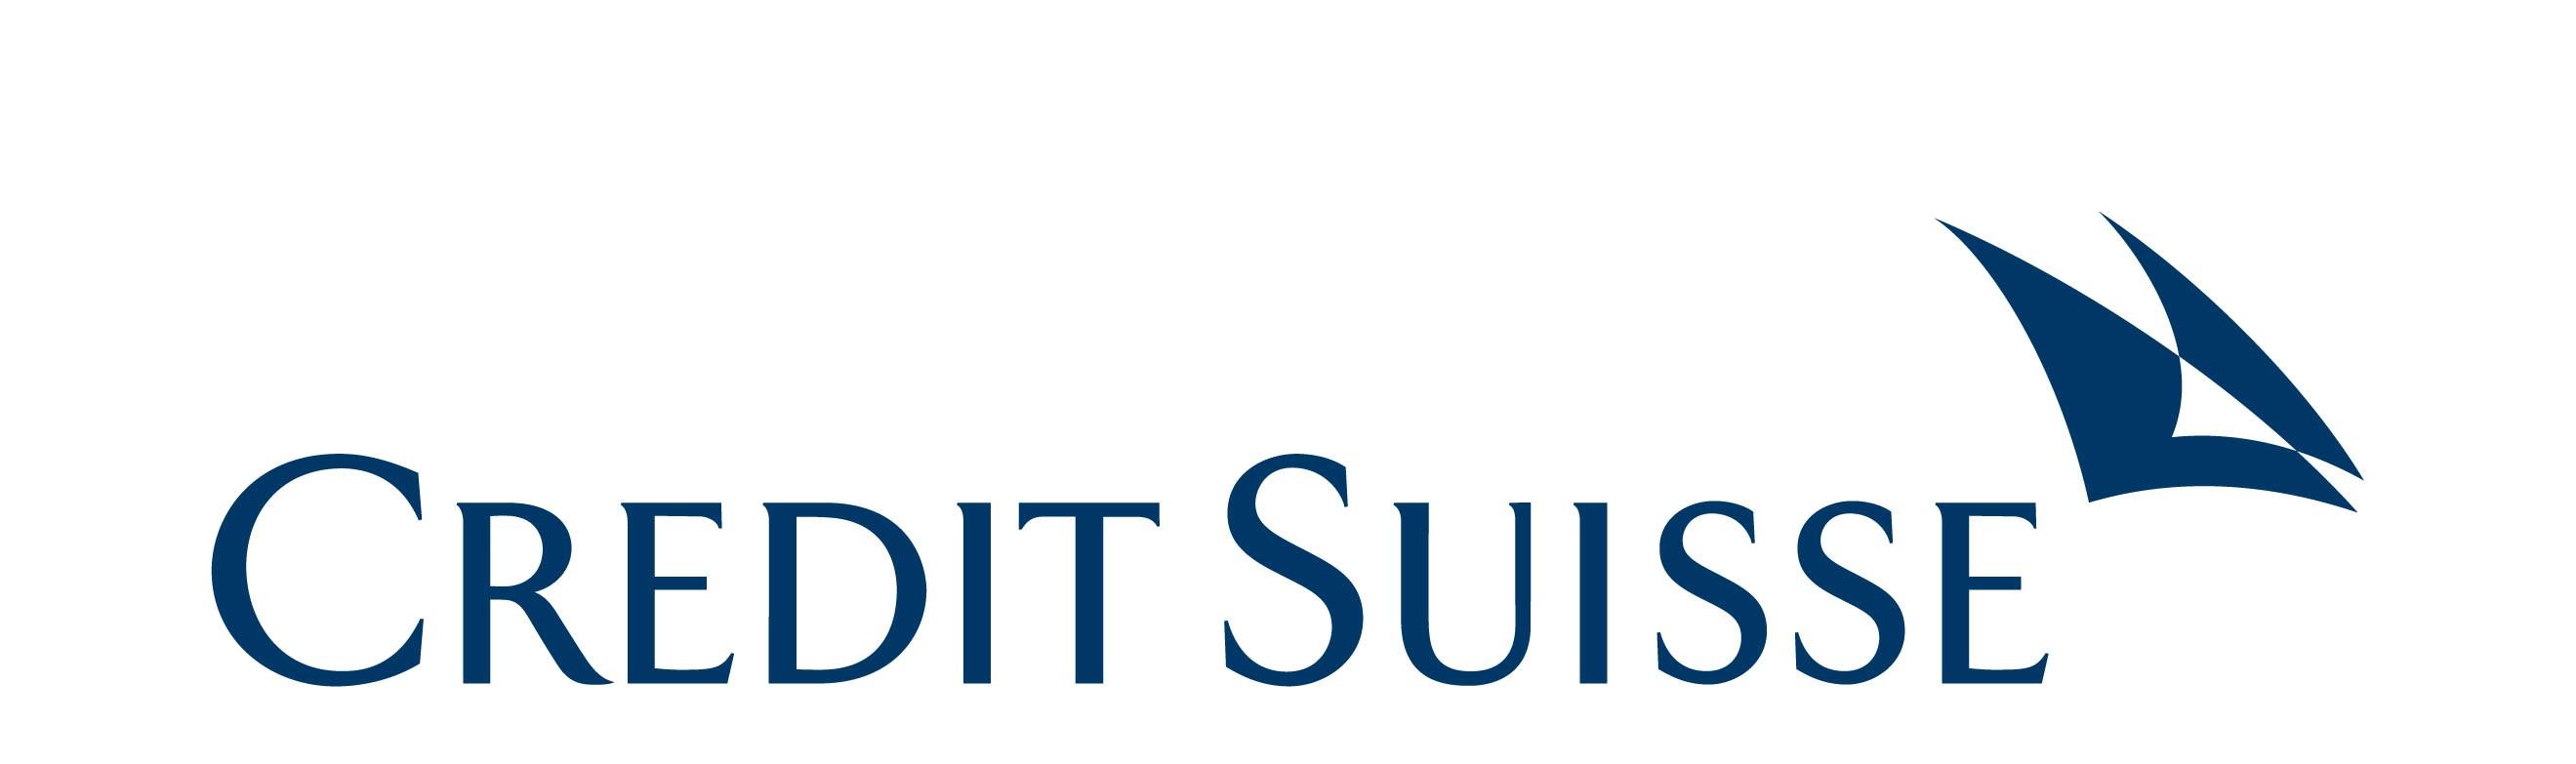 Company logo: credit suisse